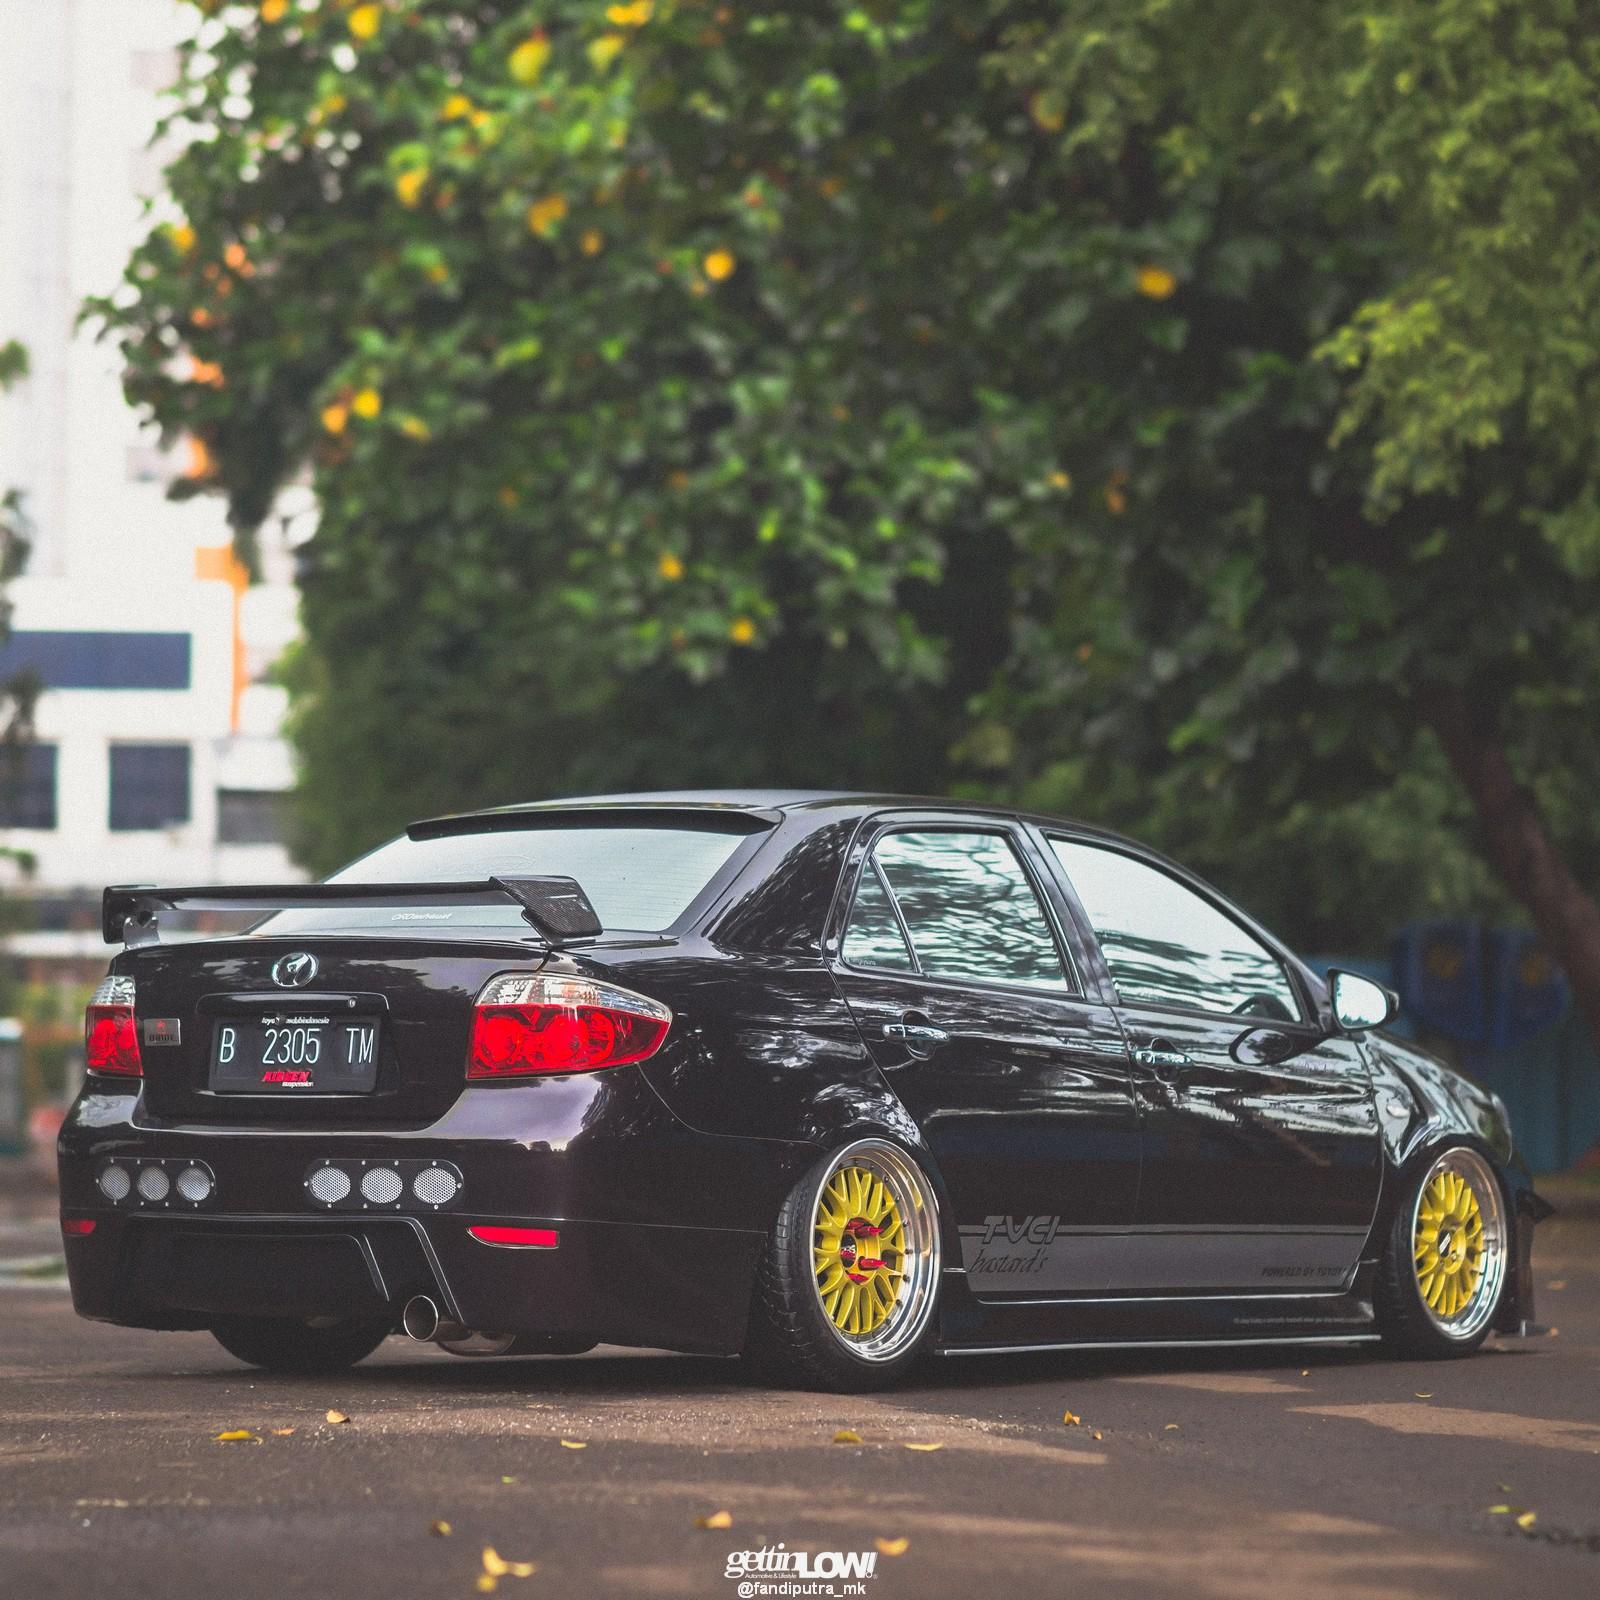 Bagged-Toyota-Vios-Black